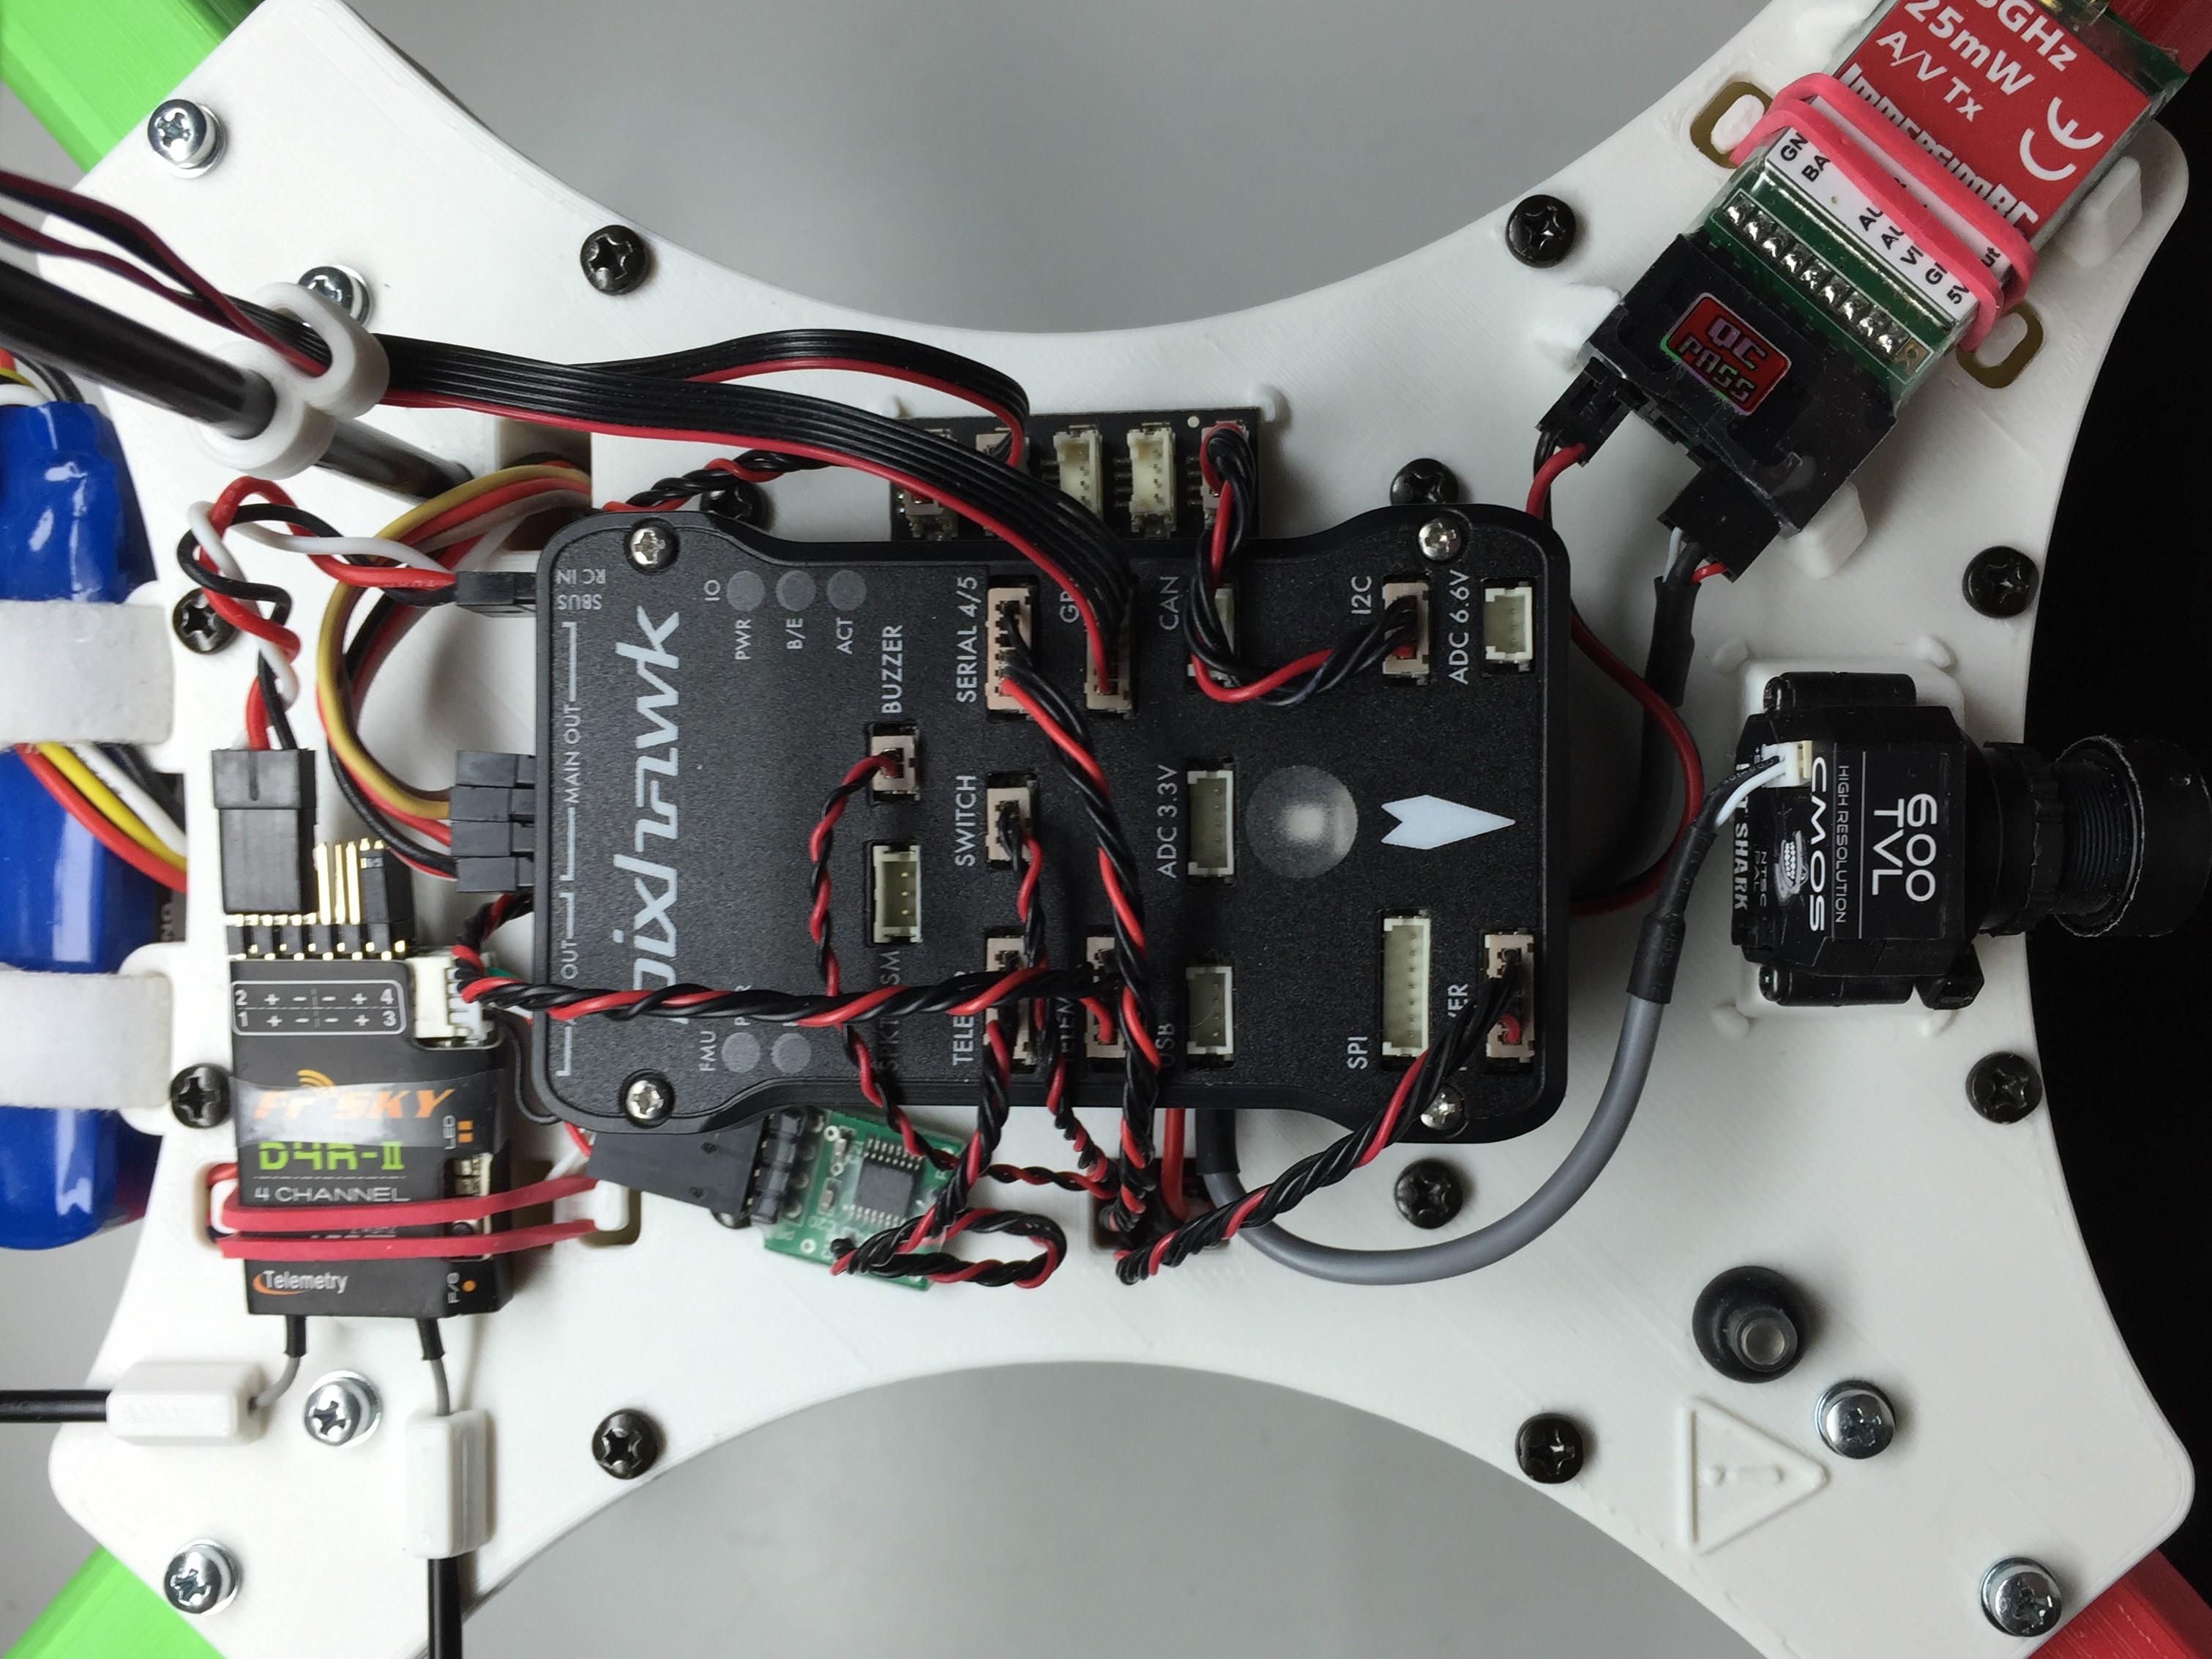 Pixhawk Esc Wiring Diagram | Manual E-Books - Pixhawk Wiring Diagram